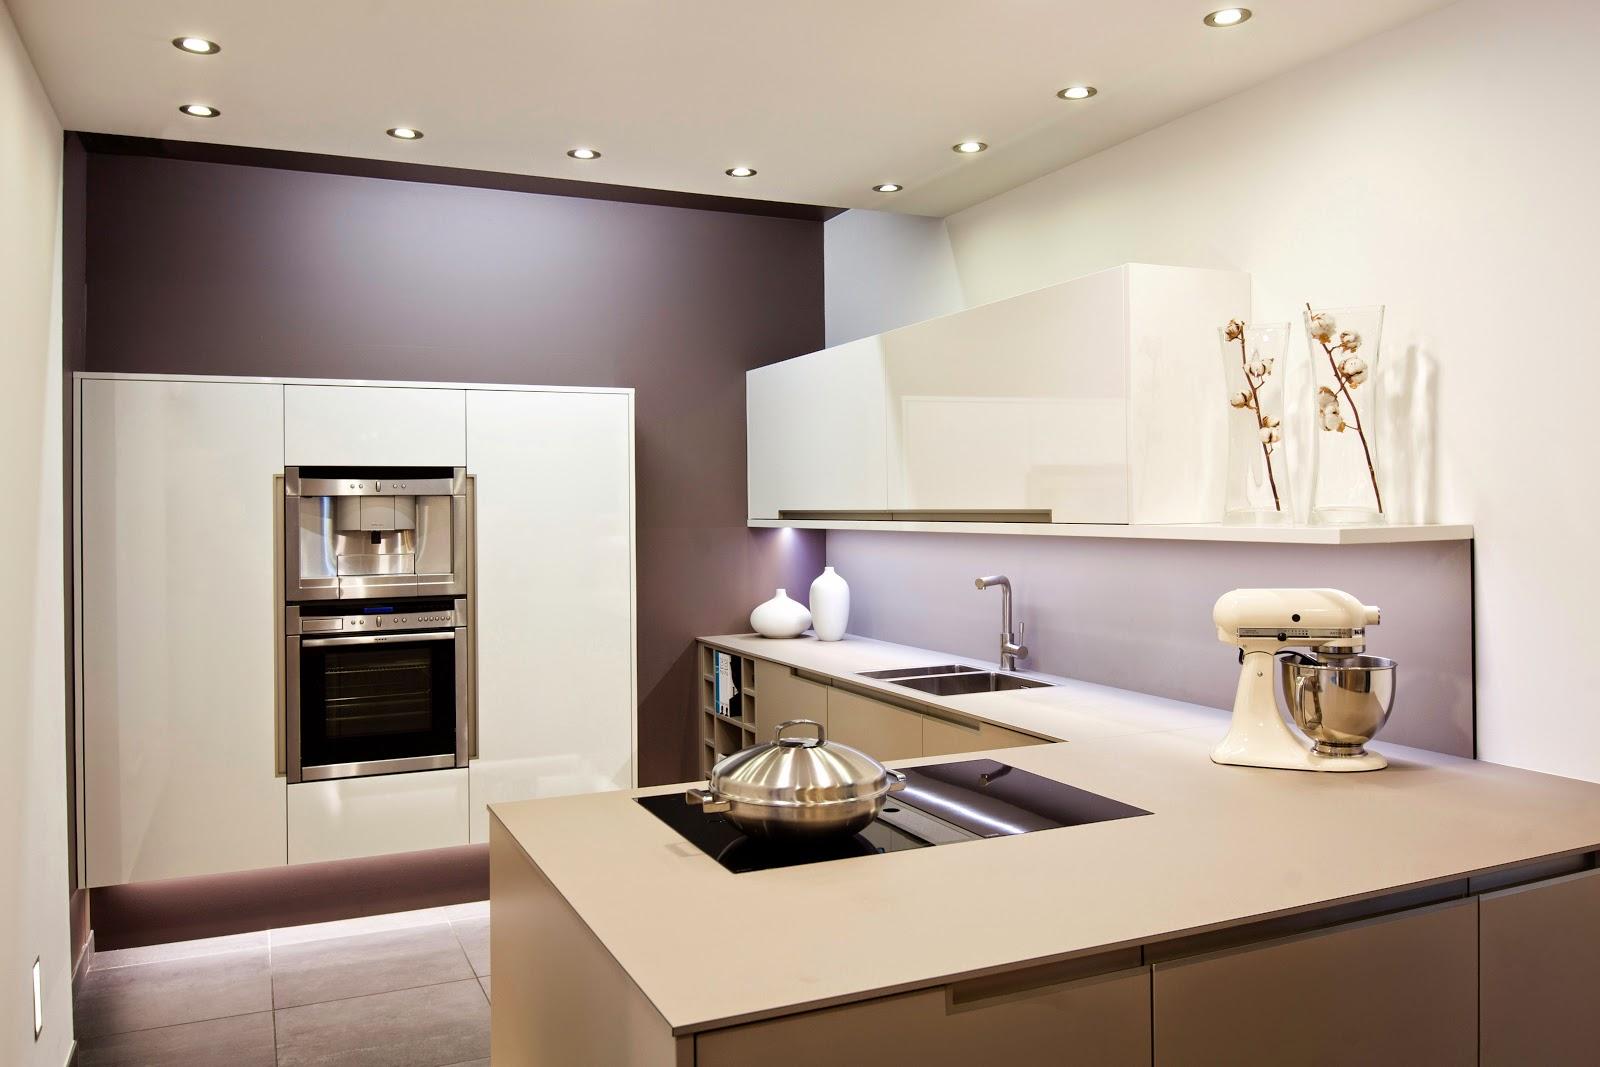 Laminaat In Keuken : Princess keukens luca inline een full laminaat keuken die bruist